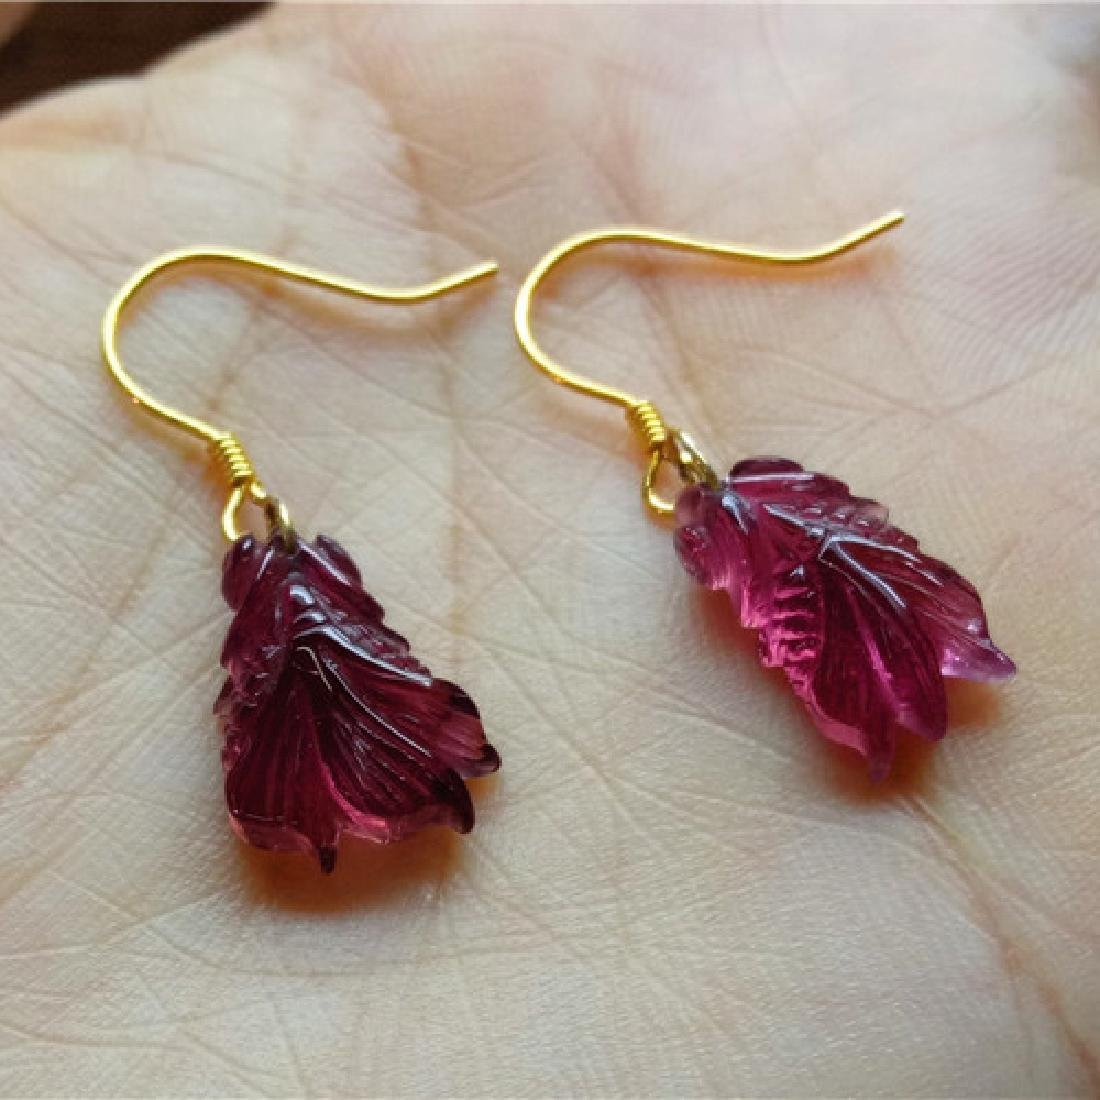 Pair of Tourmaline Earring